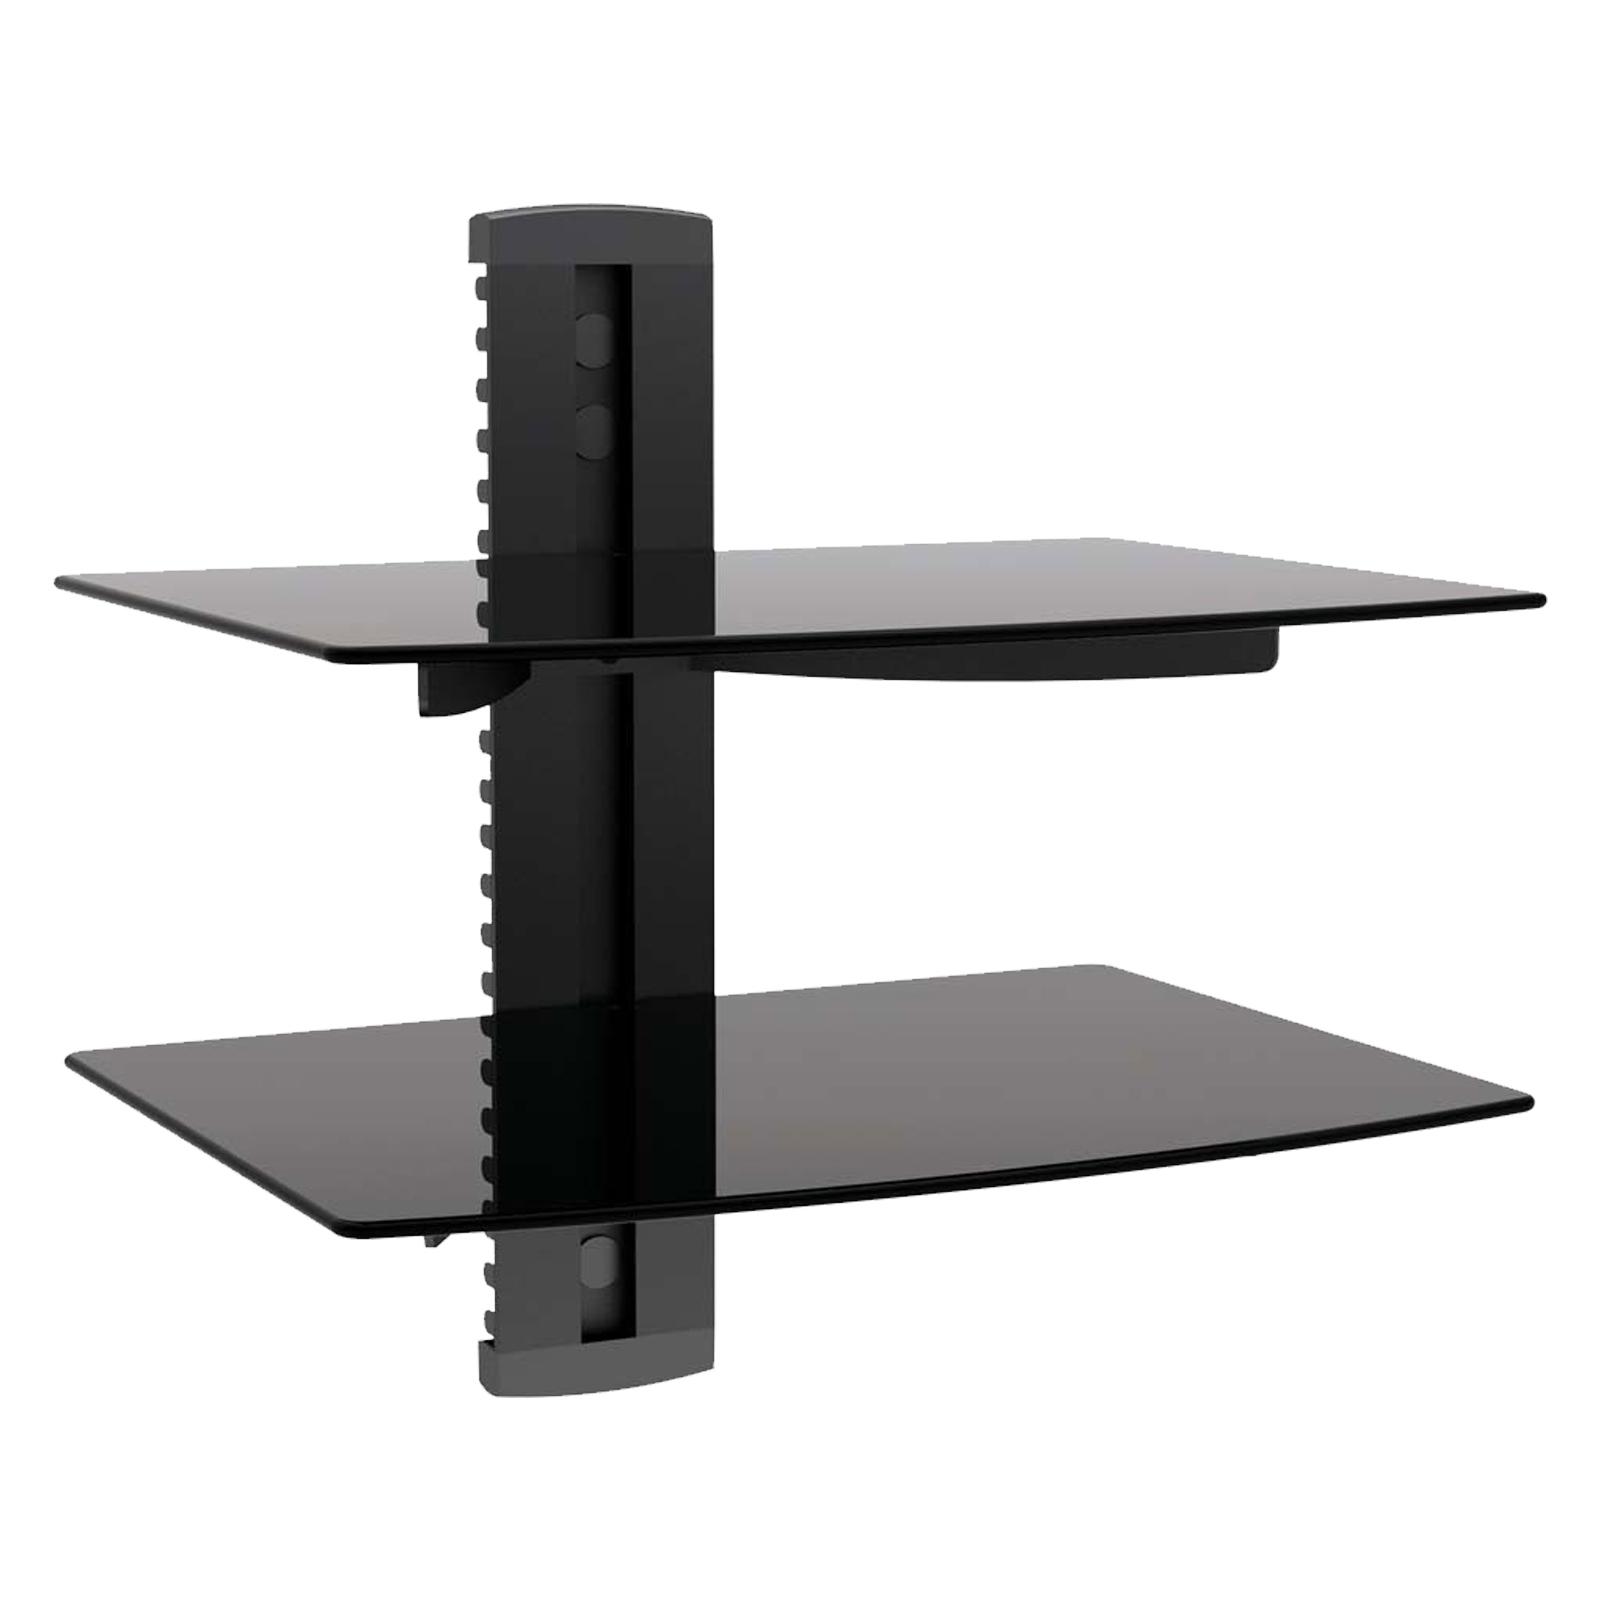 Single stud tv wall mount - Megamounts Tempered Glass Double Single Stud Shelf Wall Mount